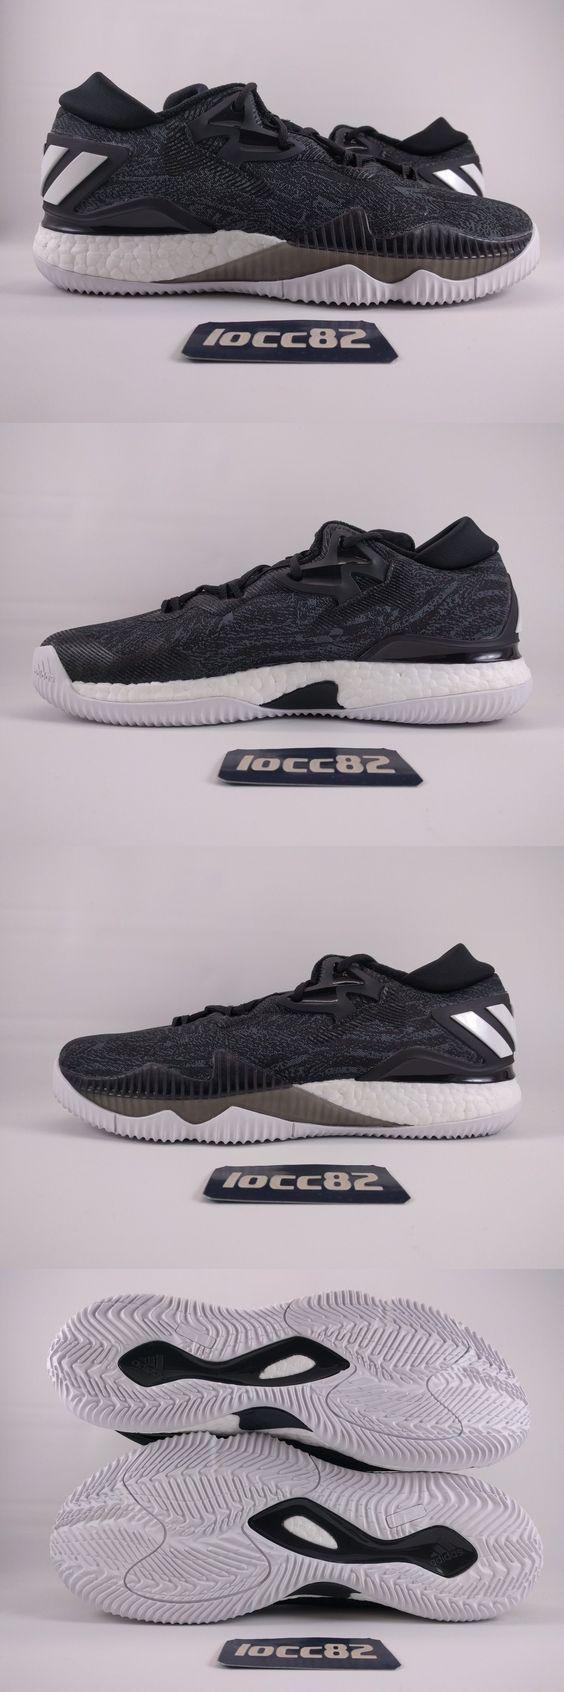 buy basketball shoes